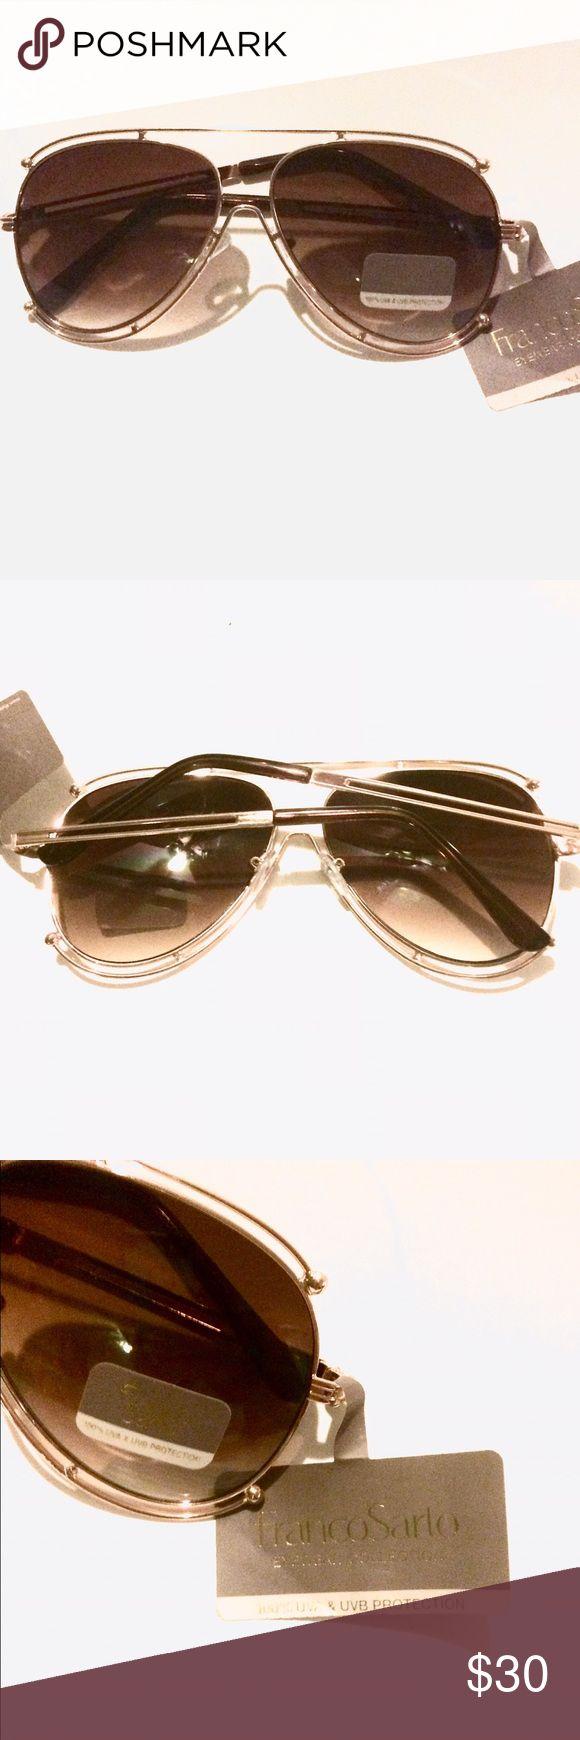 Franco Sarto Sunglasses NEW UV protective singlasses by Franco Sarto. Stylish double rim aviator/movie star look! Beautiful with full coverage! Franco Sarto Accessories Glasses